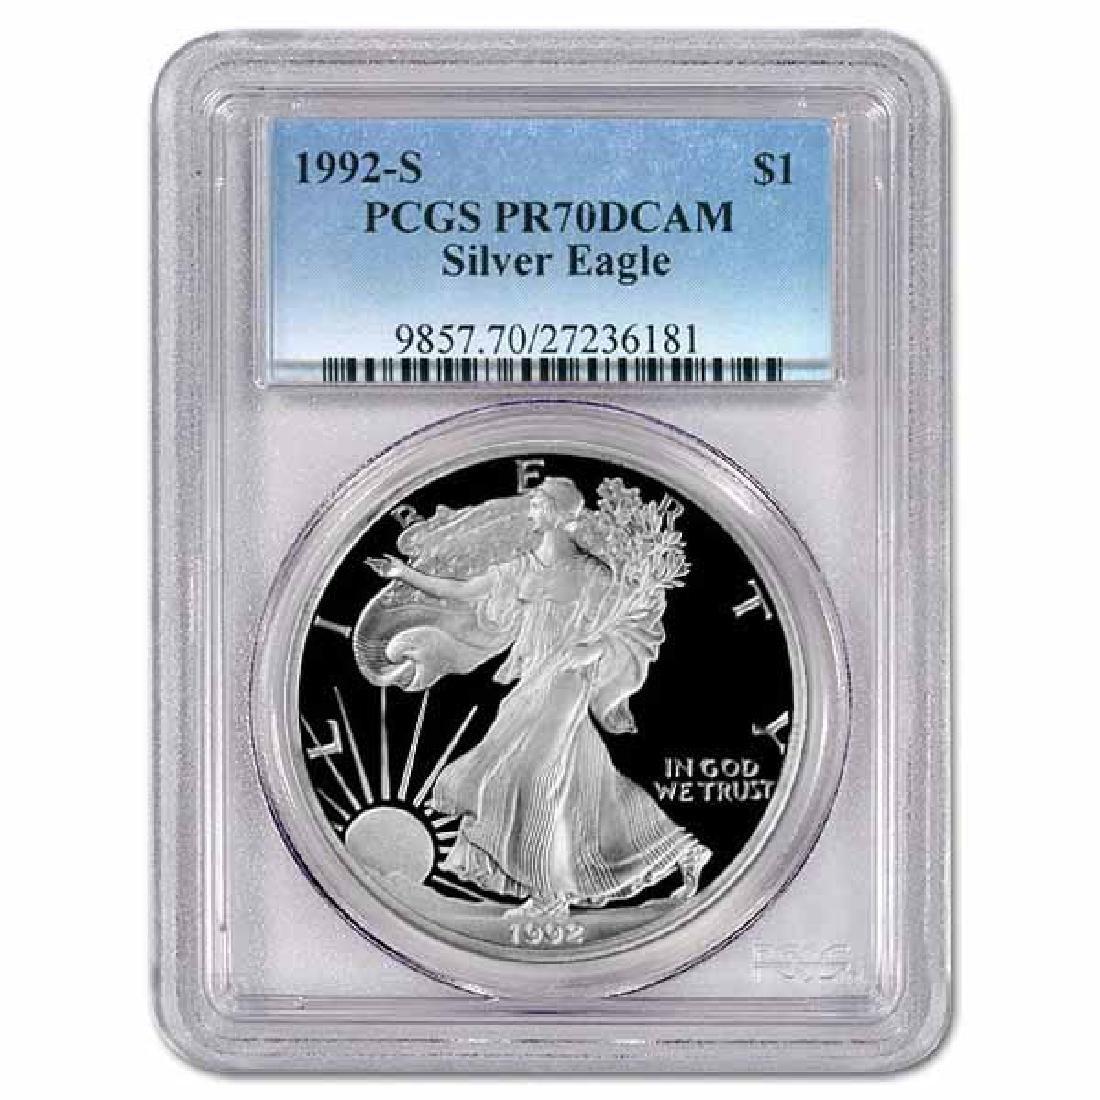 Certified Proof Silver Eagle 1992-S PR70DCAM PCGS